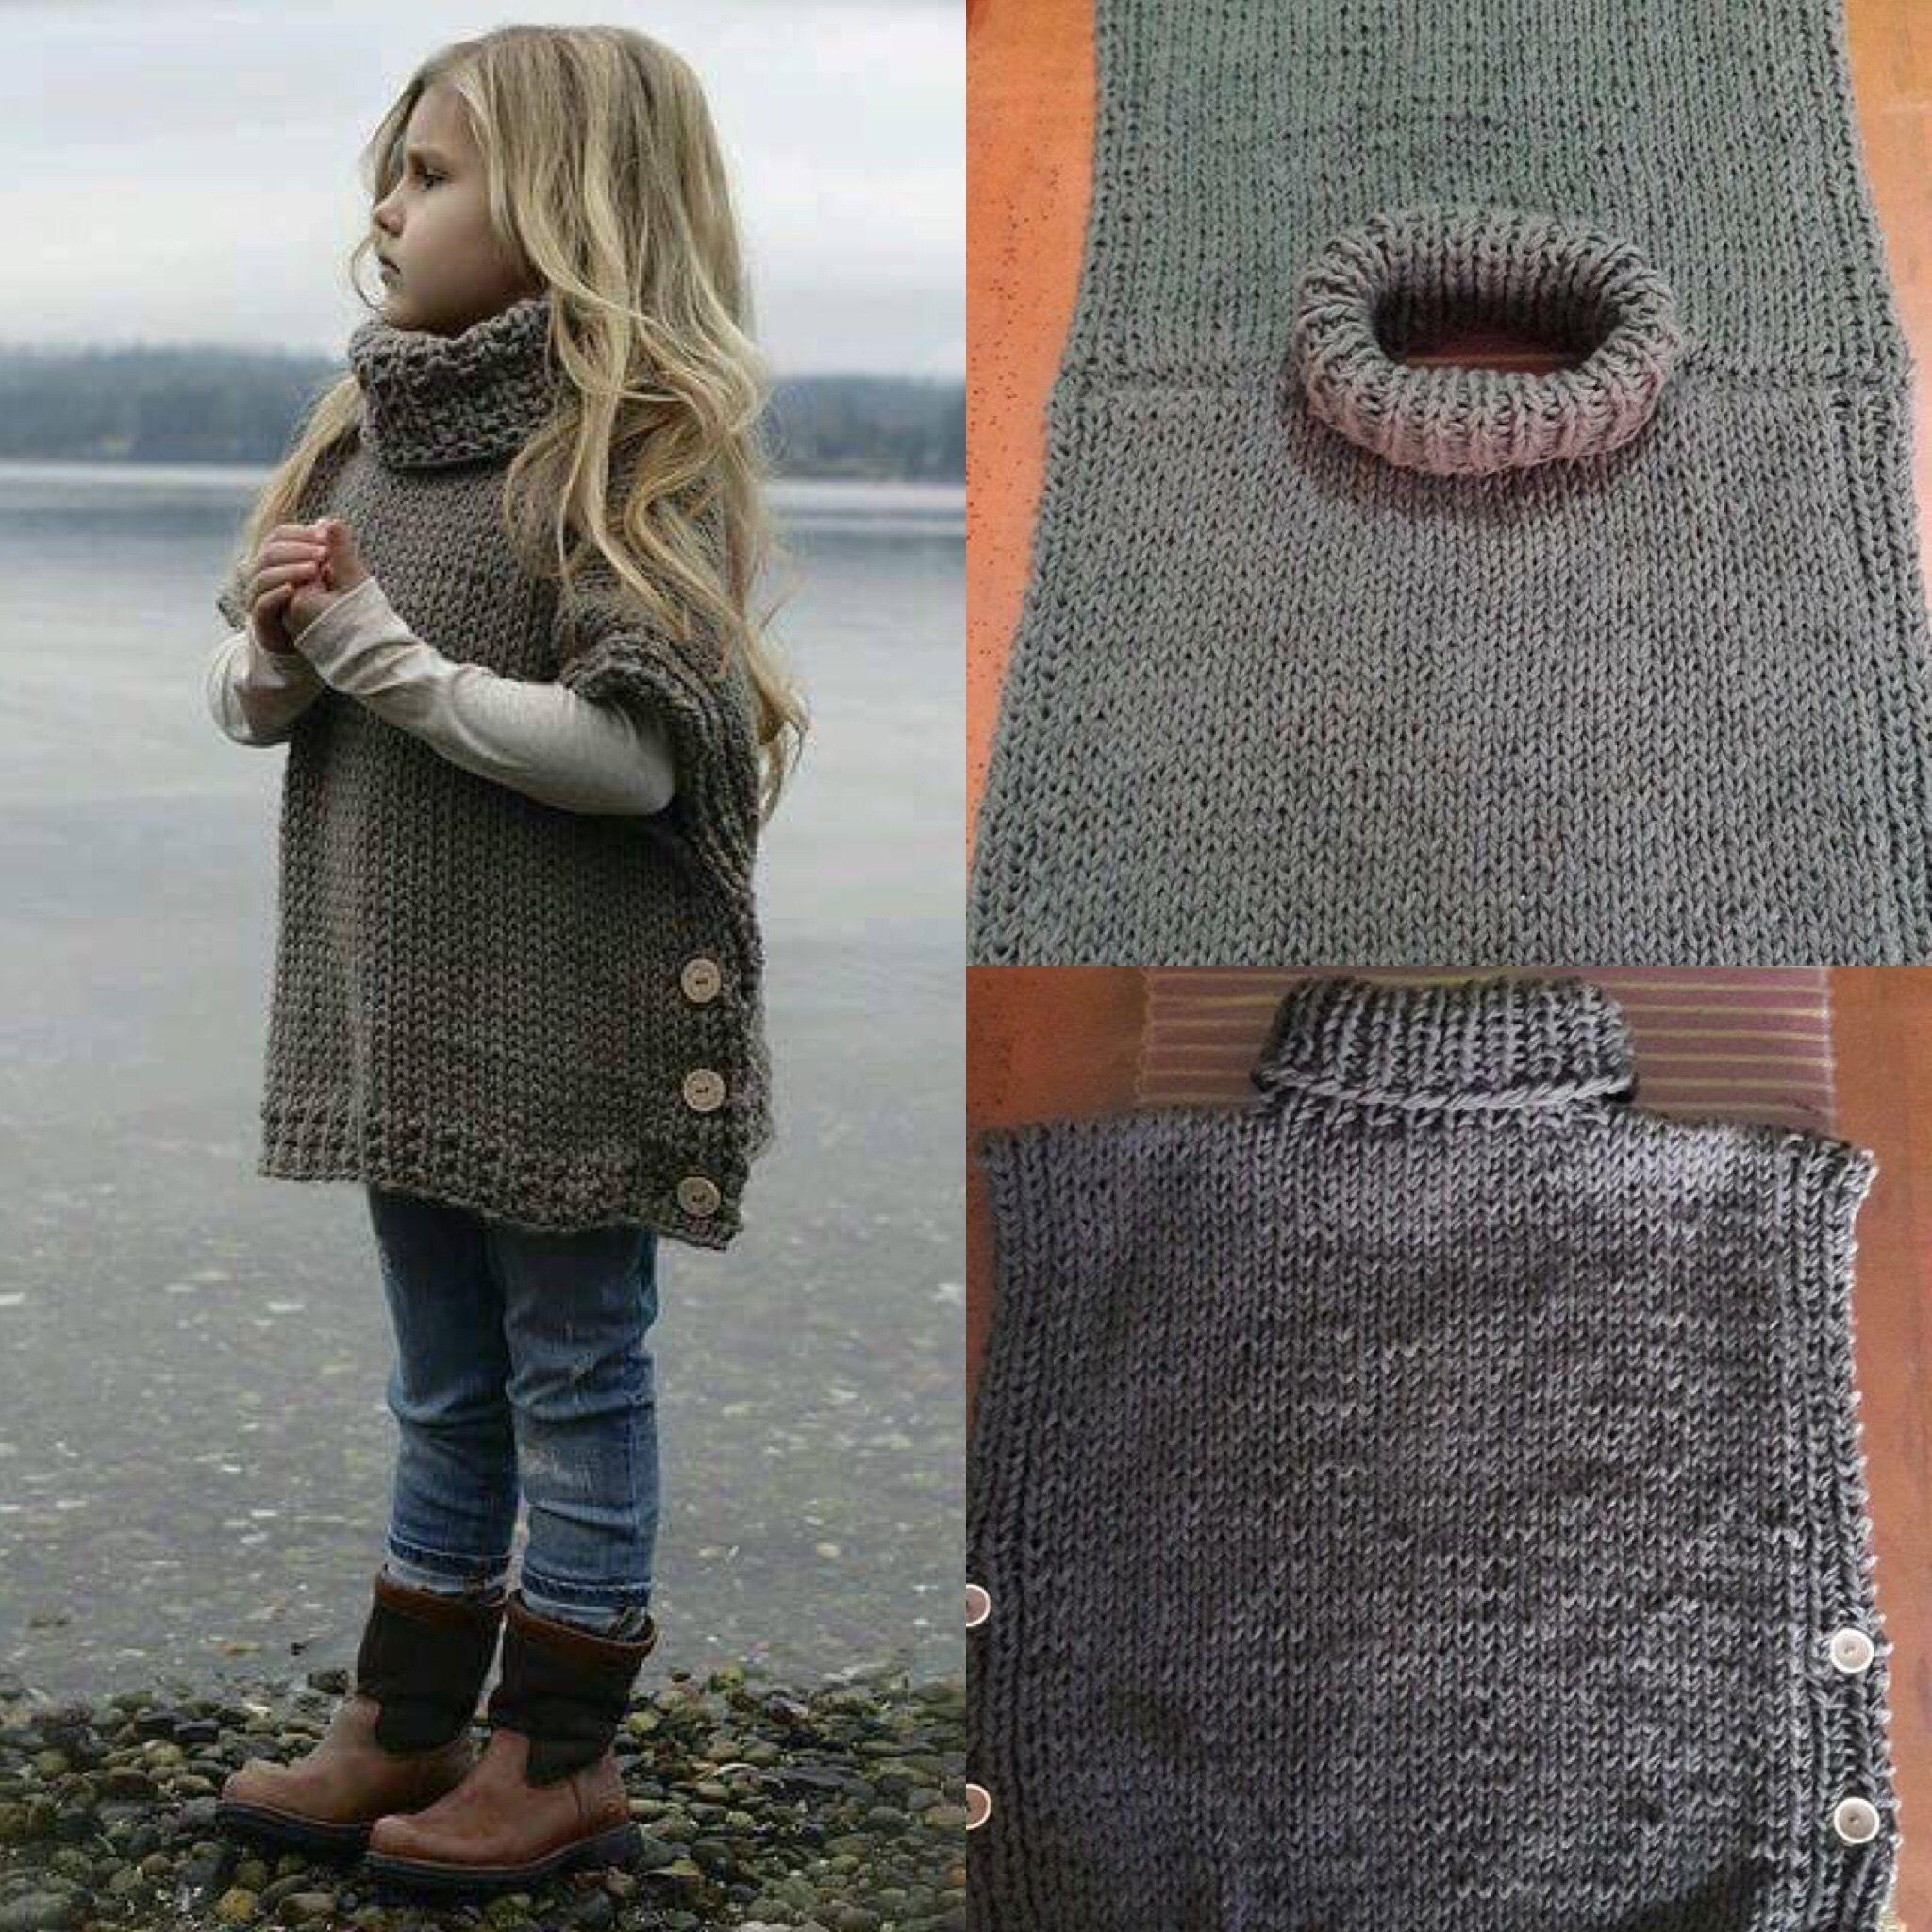 94e428b42 Azel Pullover pattern by Heidi May